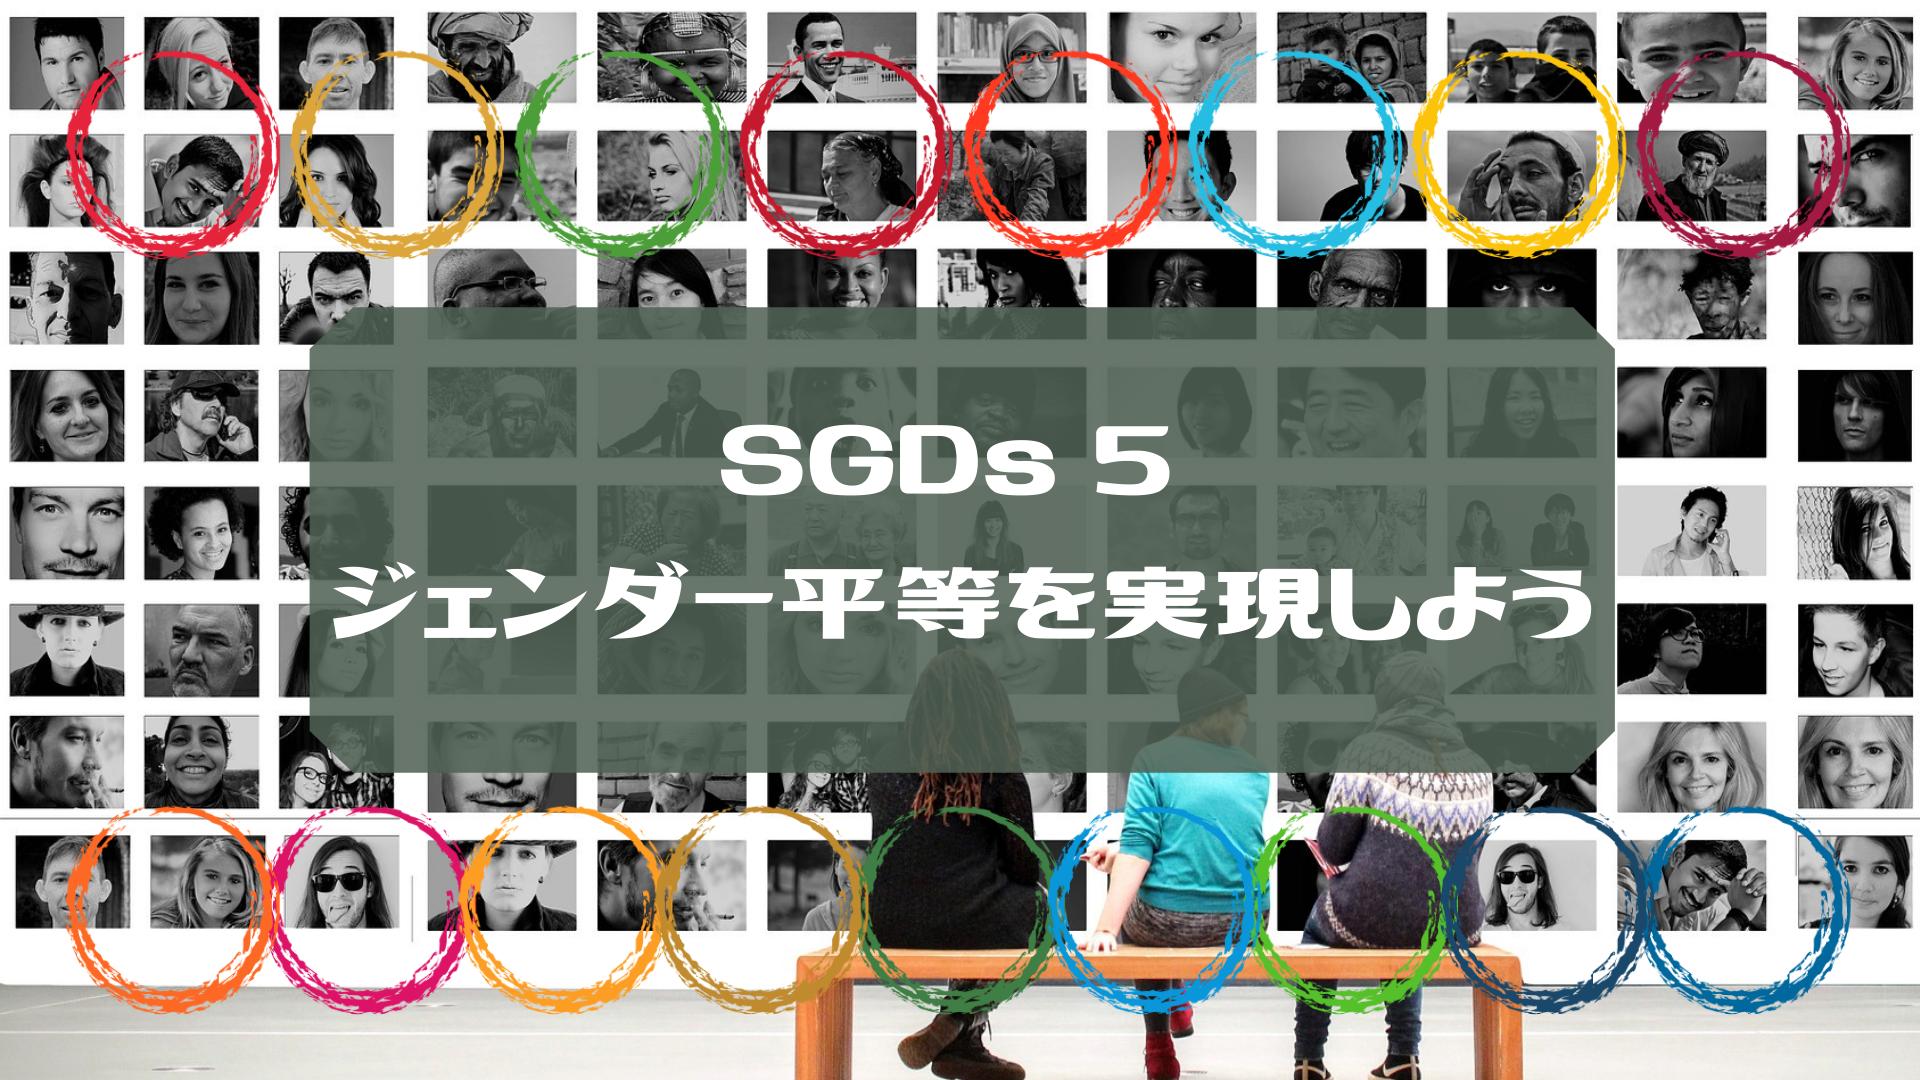 SDGs目標5「ジェンダー平等を実現しよう」とは|SDGsに取り組む企業担当者のインタビューも